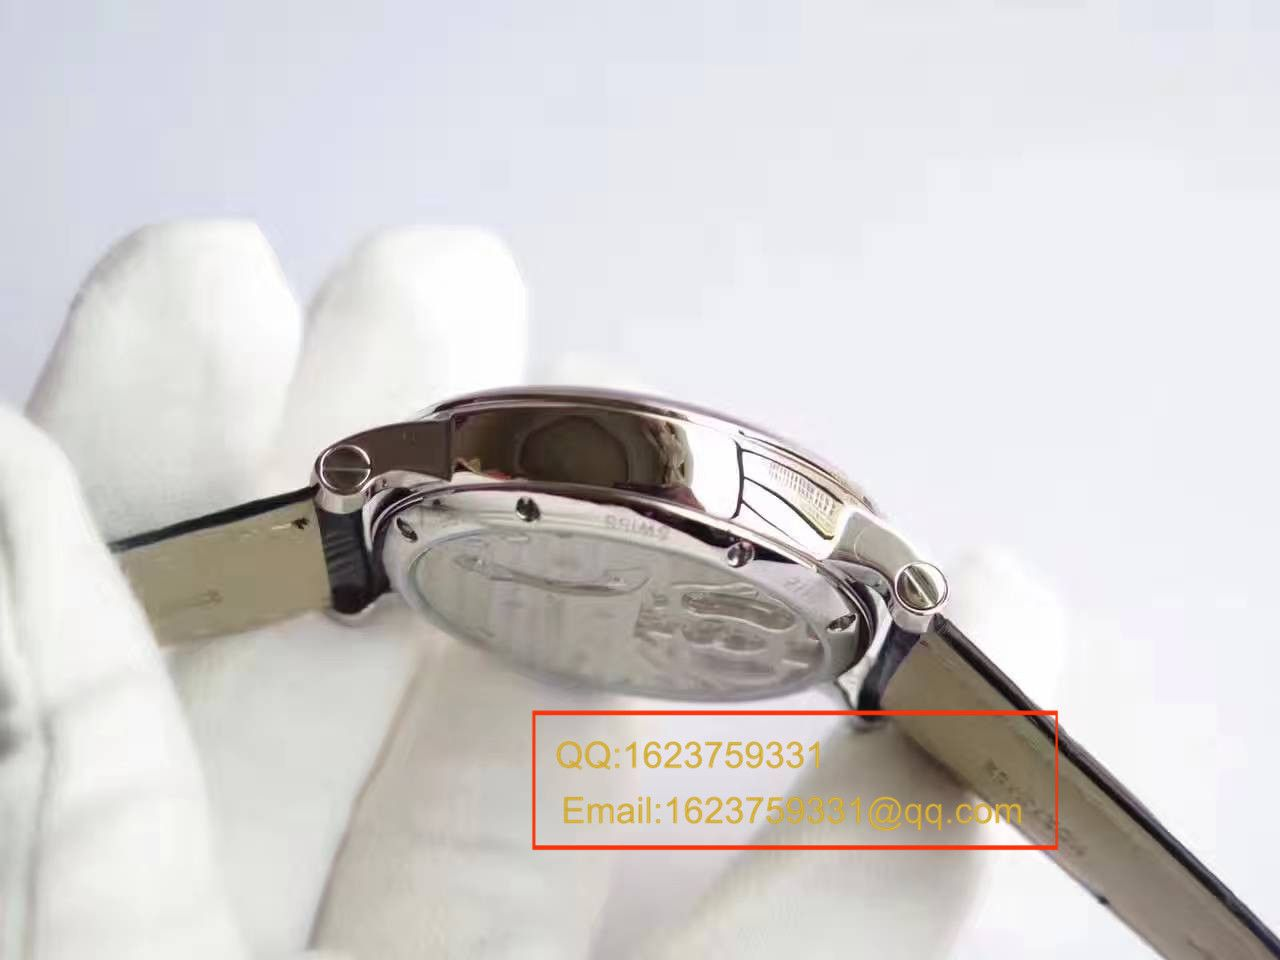 【BL厂一比一精仿手表】卡地亚ROTONDE DE CARTIER系列W1556216陀飞轮腕表 / KCI114